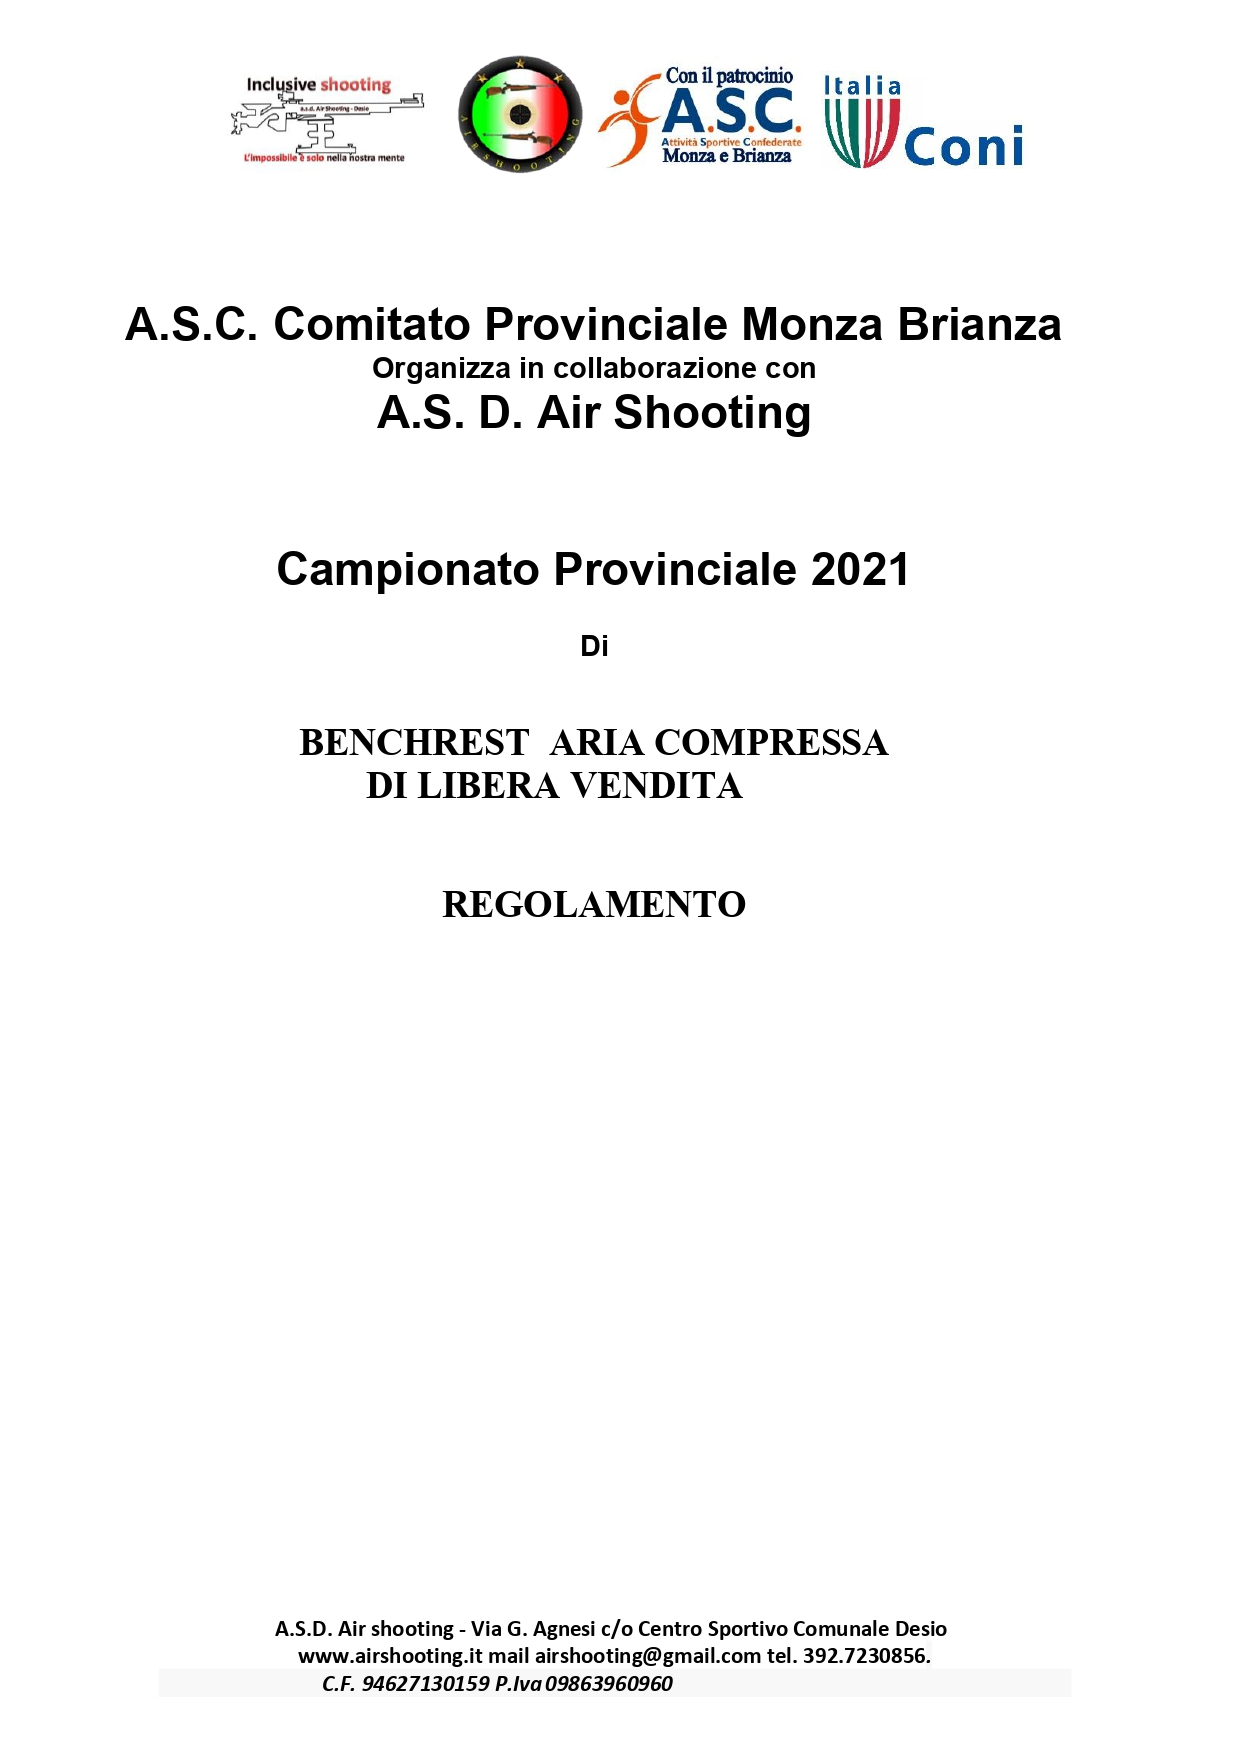 reg campionato 2021 1_page-0002